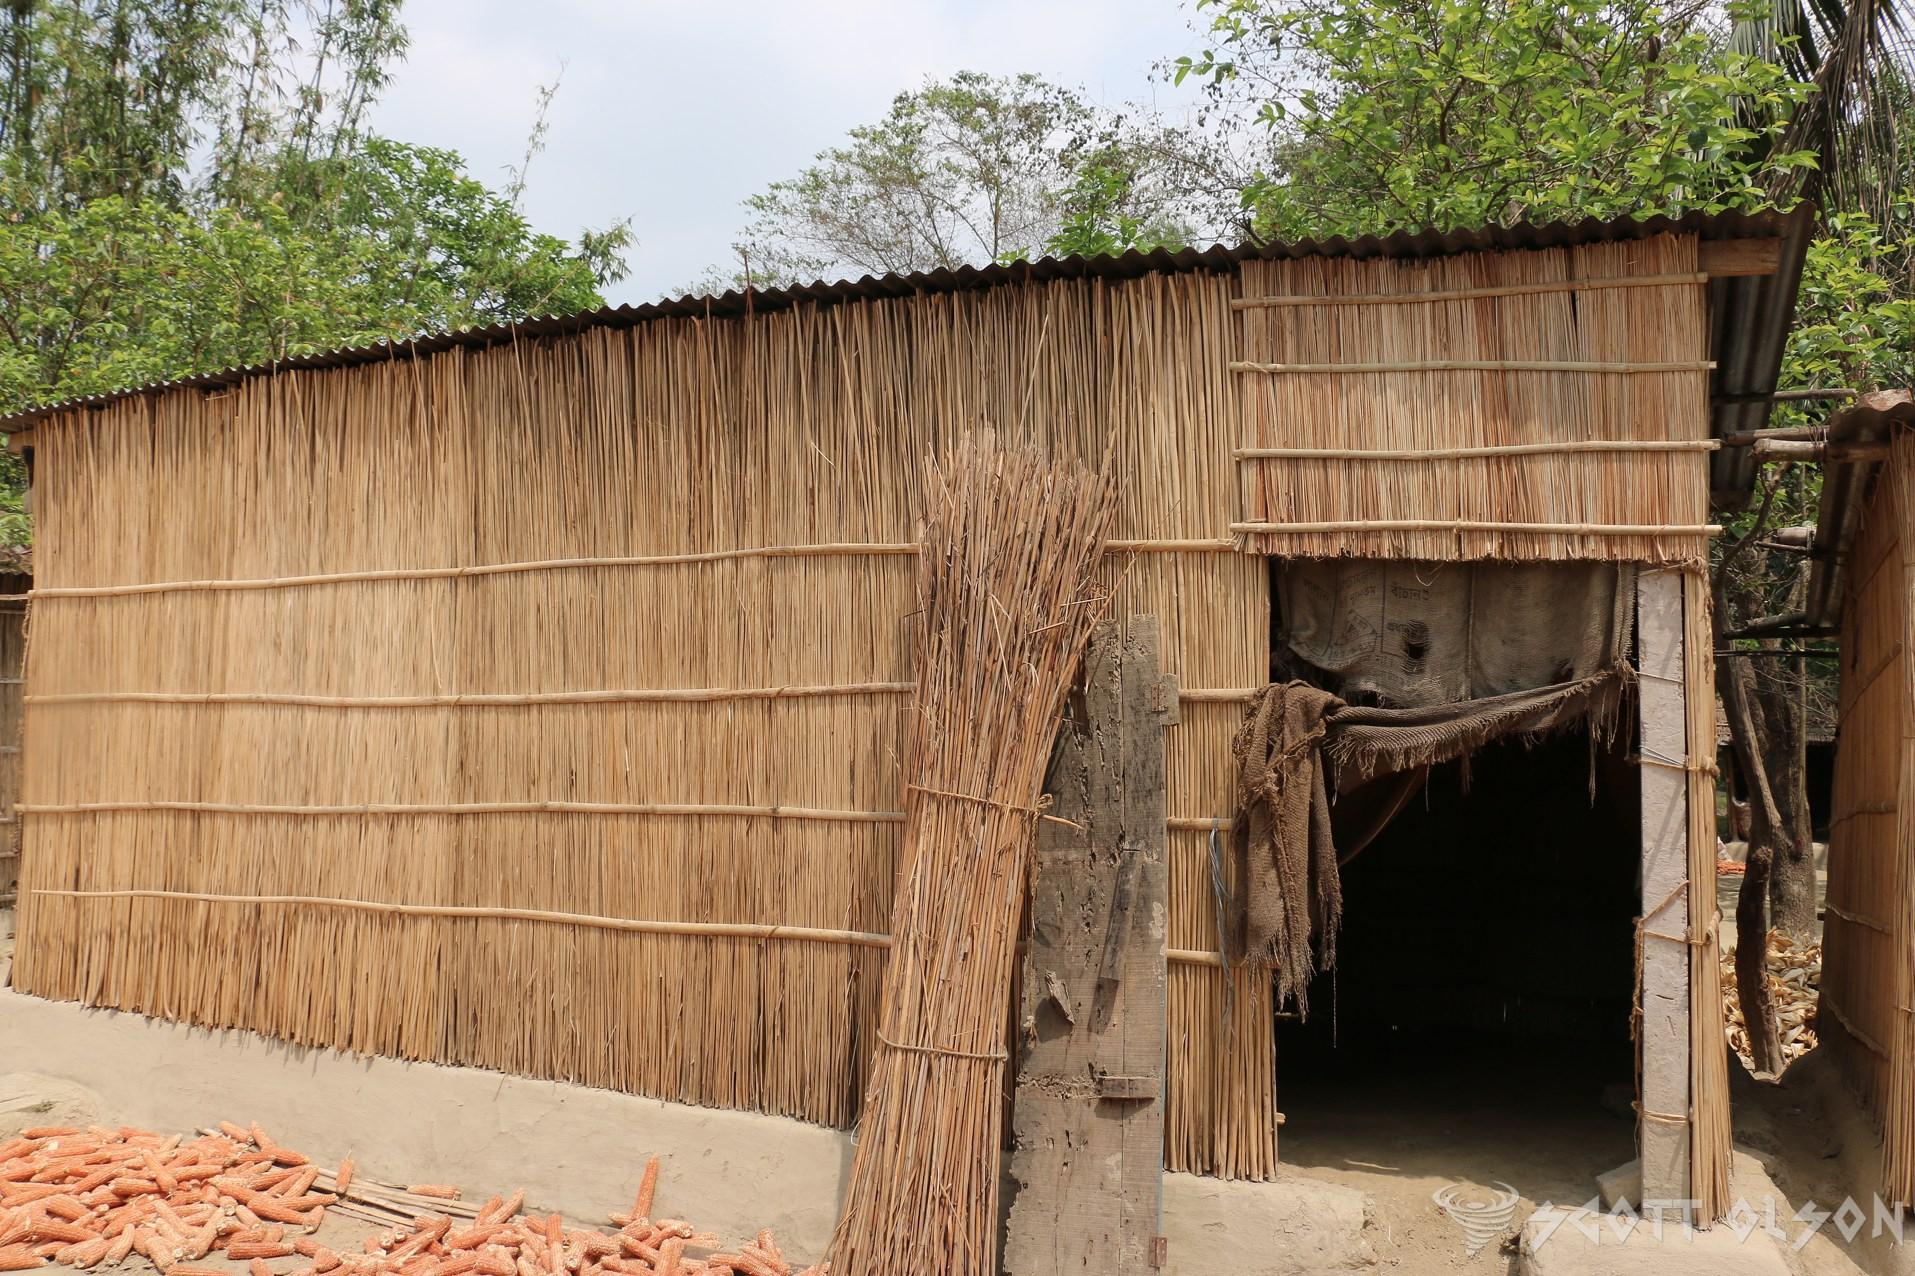 Photo gallery journey to bangladesh for Bangladeshi house image